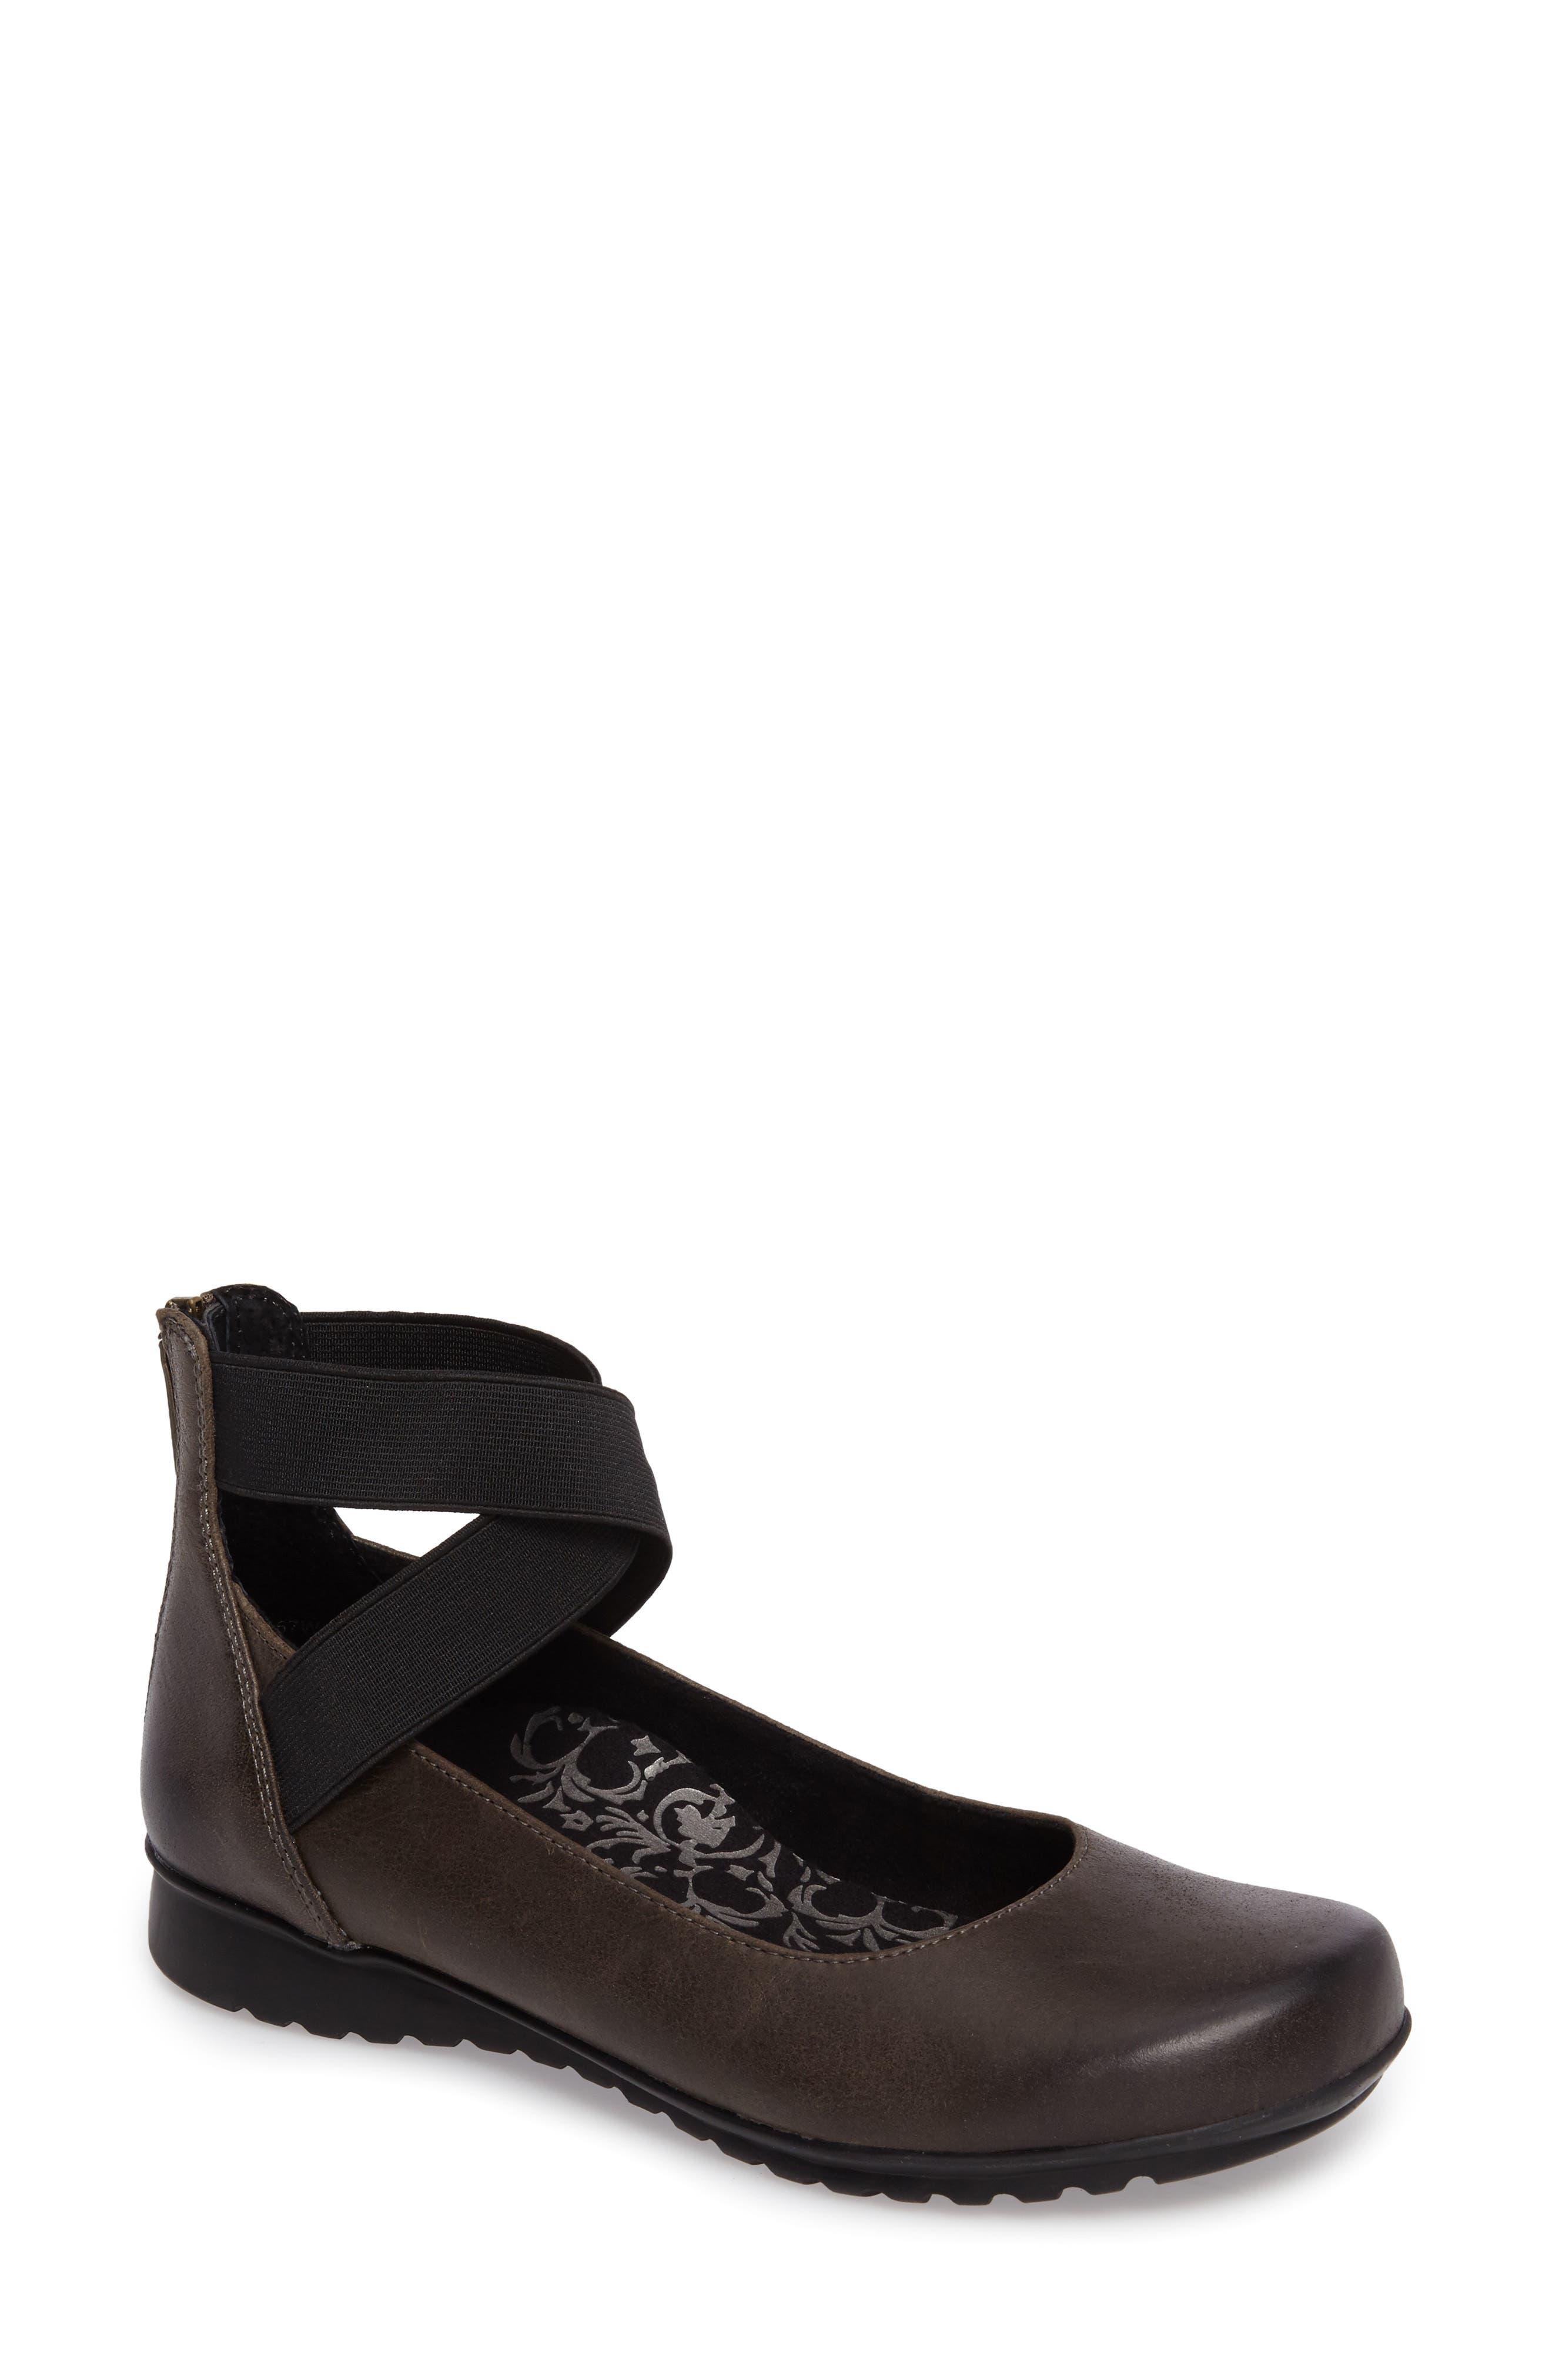 'Dakota' Ankle Strap Ballet Flat,                             Main thumbnail 1, color,                             Iron Leather